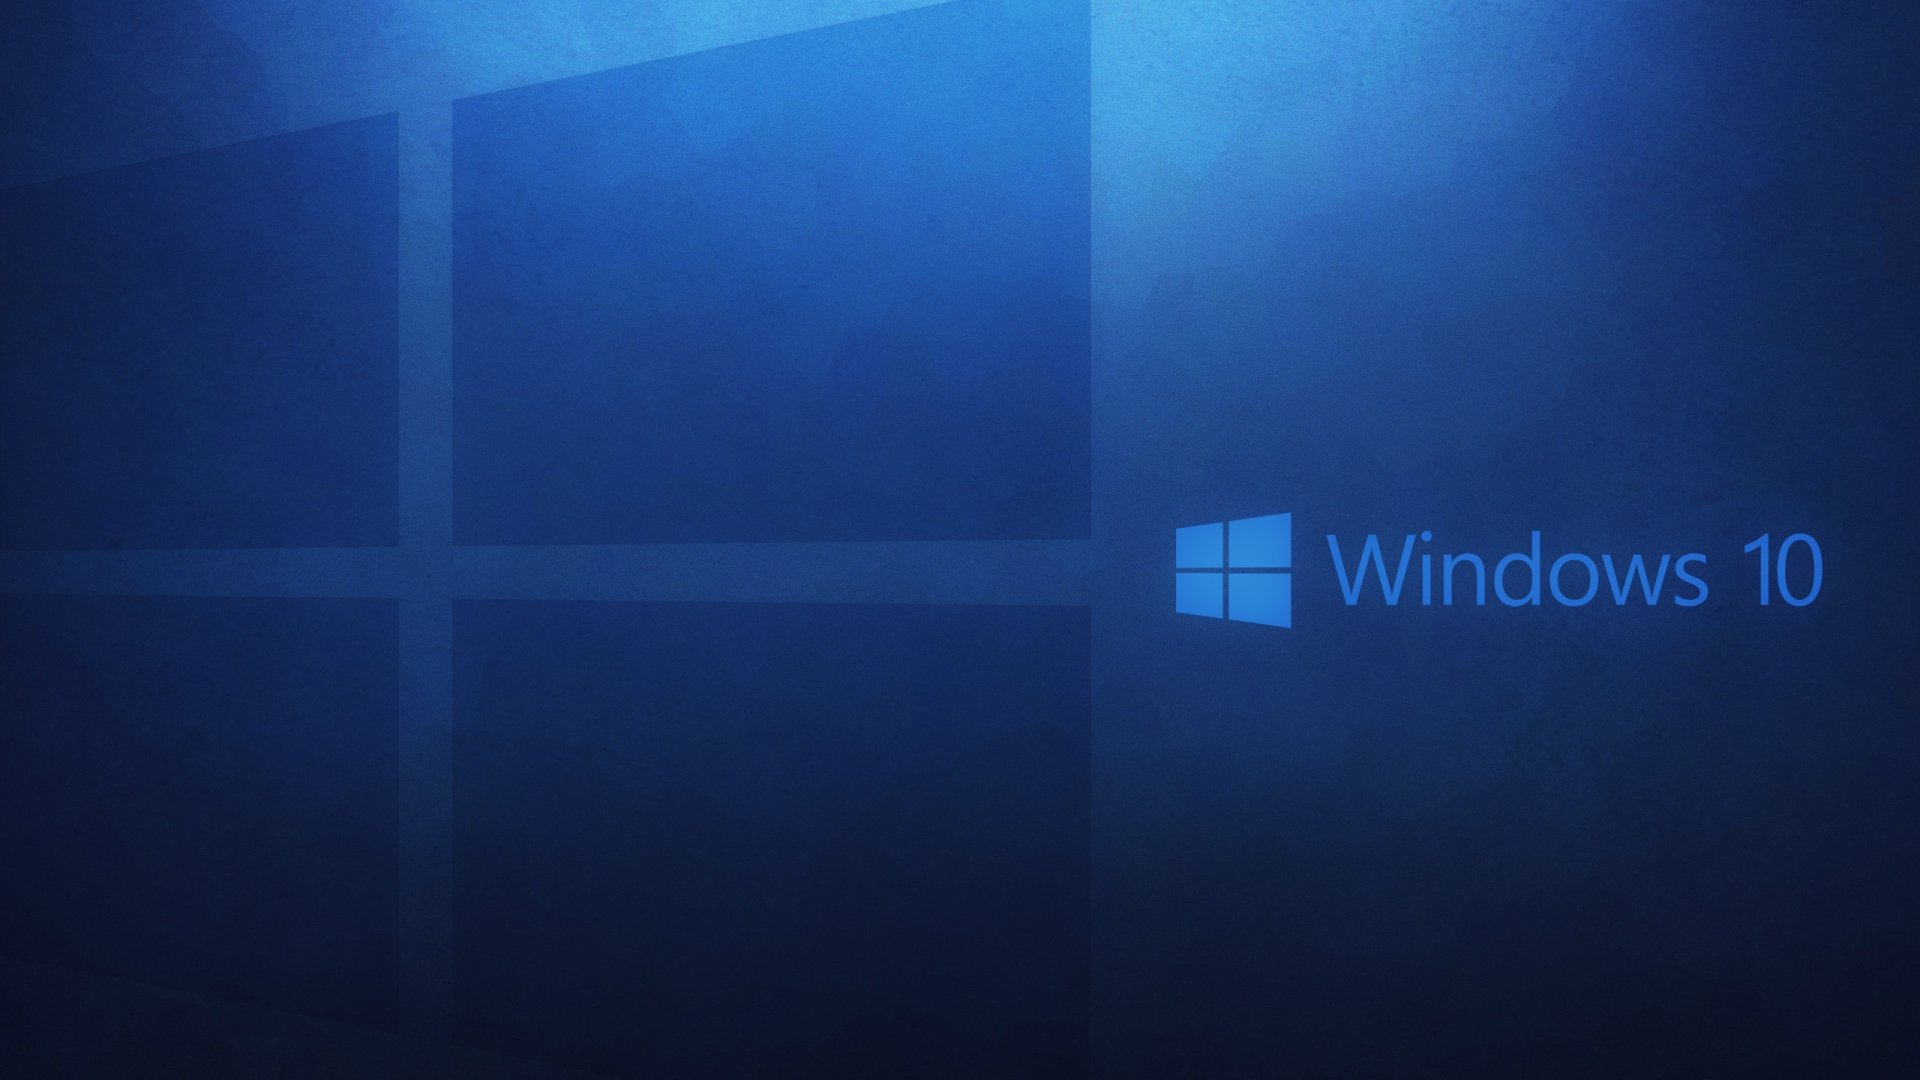 28 Hd Wallpapers 19201080 Windows 10 1920x1080